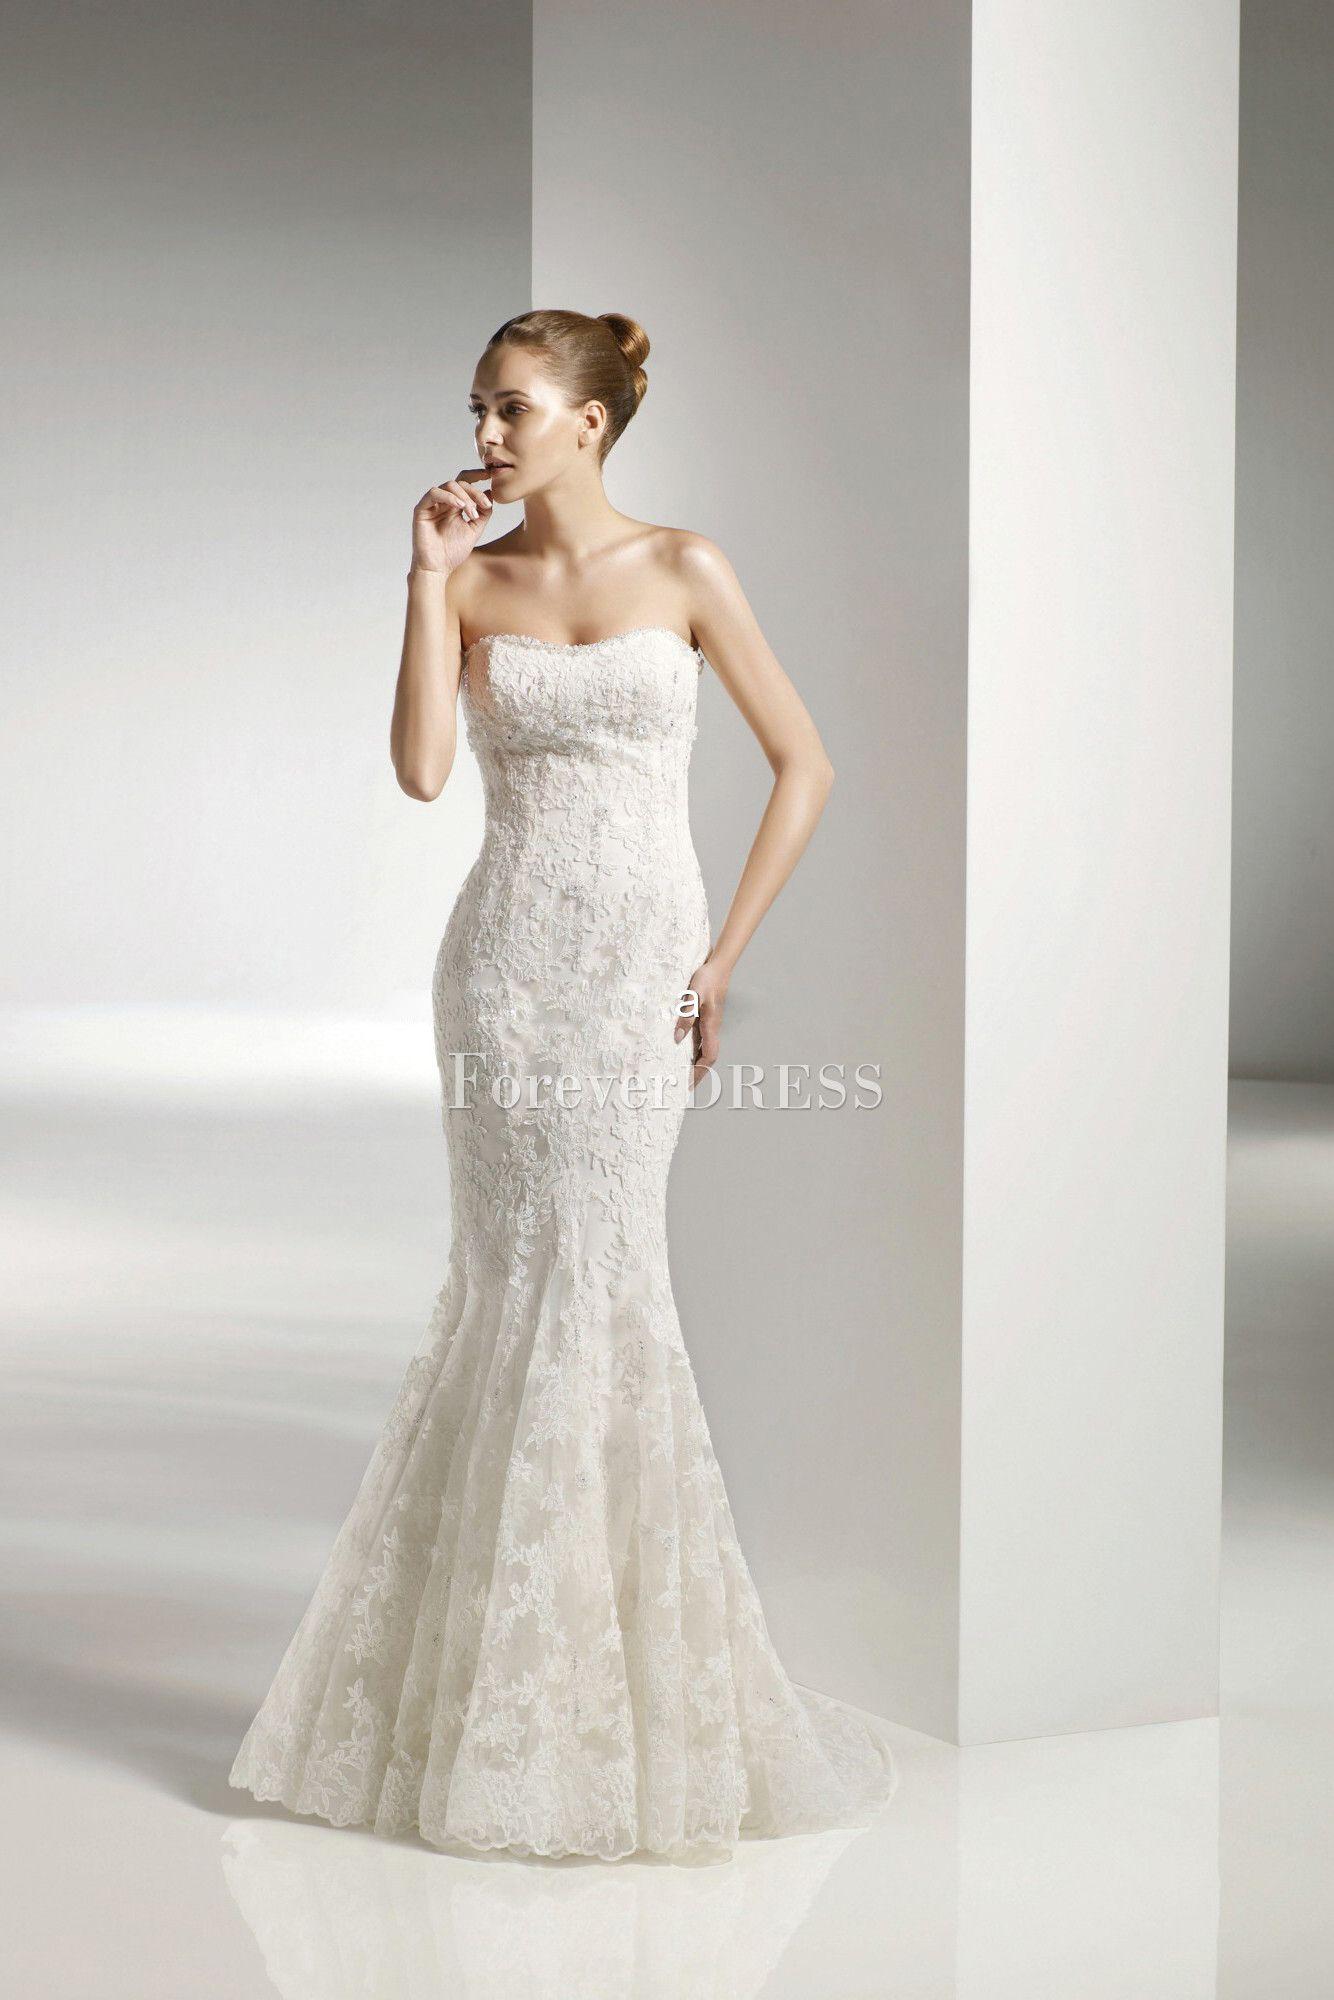 Lace Illusion Overlay Mermaid Trumpet Style Skirt Wedding Dress